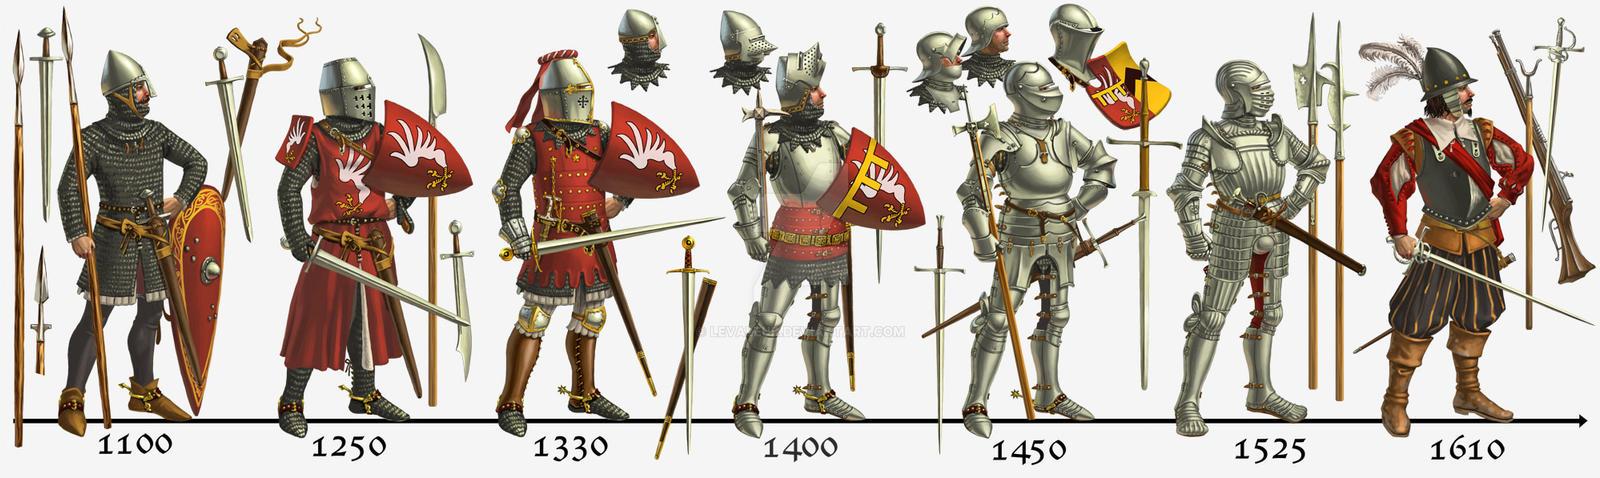 Armour evolution by LeValeur